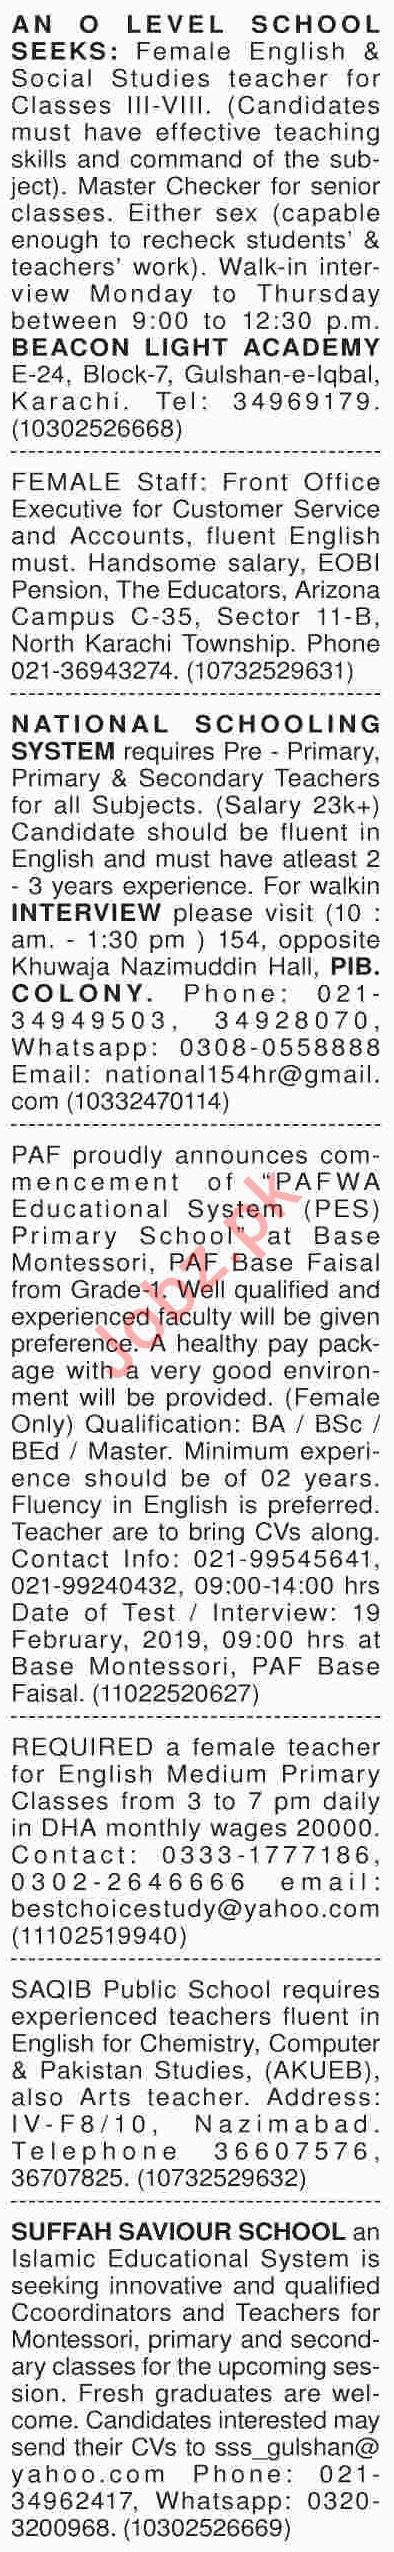 Dawn Sunday Classified Ads 17th Feb 2019 for Teaching Staff